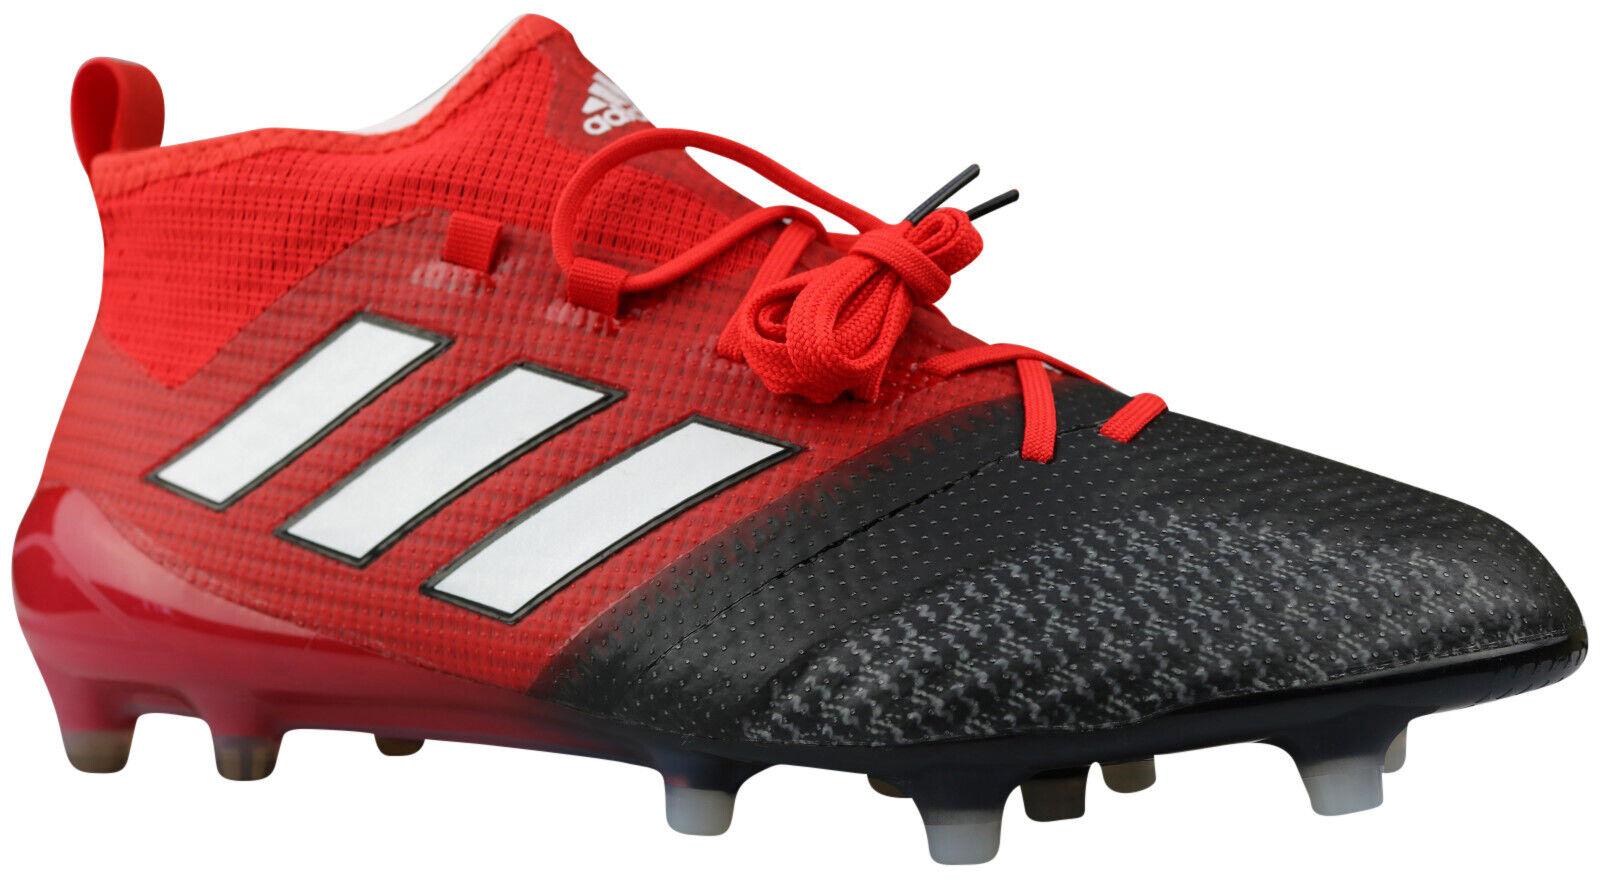 Adidas Ace 17.1 primeknit FG botas de fútbol levas negro bb4316 talla 42 & 44 nuevo